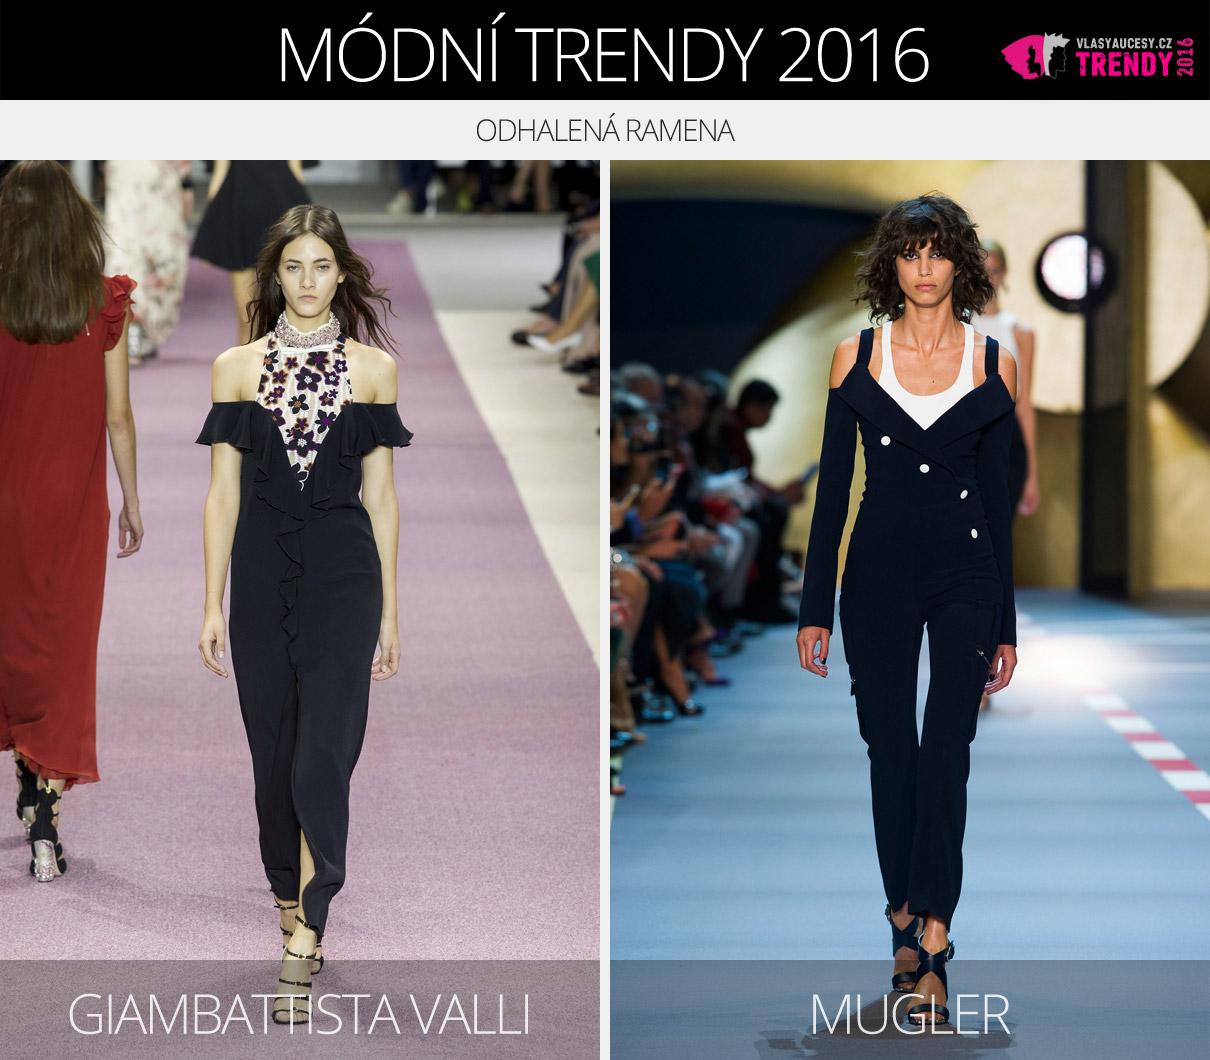 Módní trendy 2016 – odhalená ramena. (Zleva: Giambattista Valli, Mugler.)